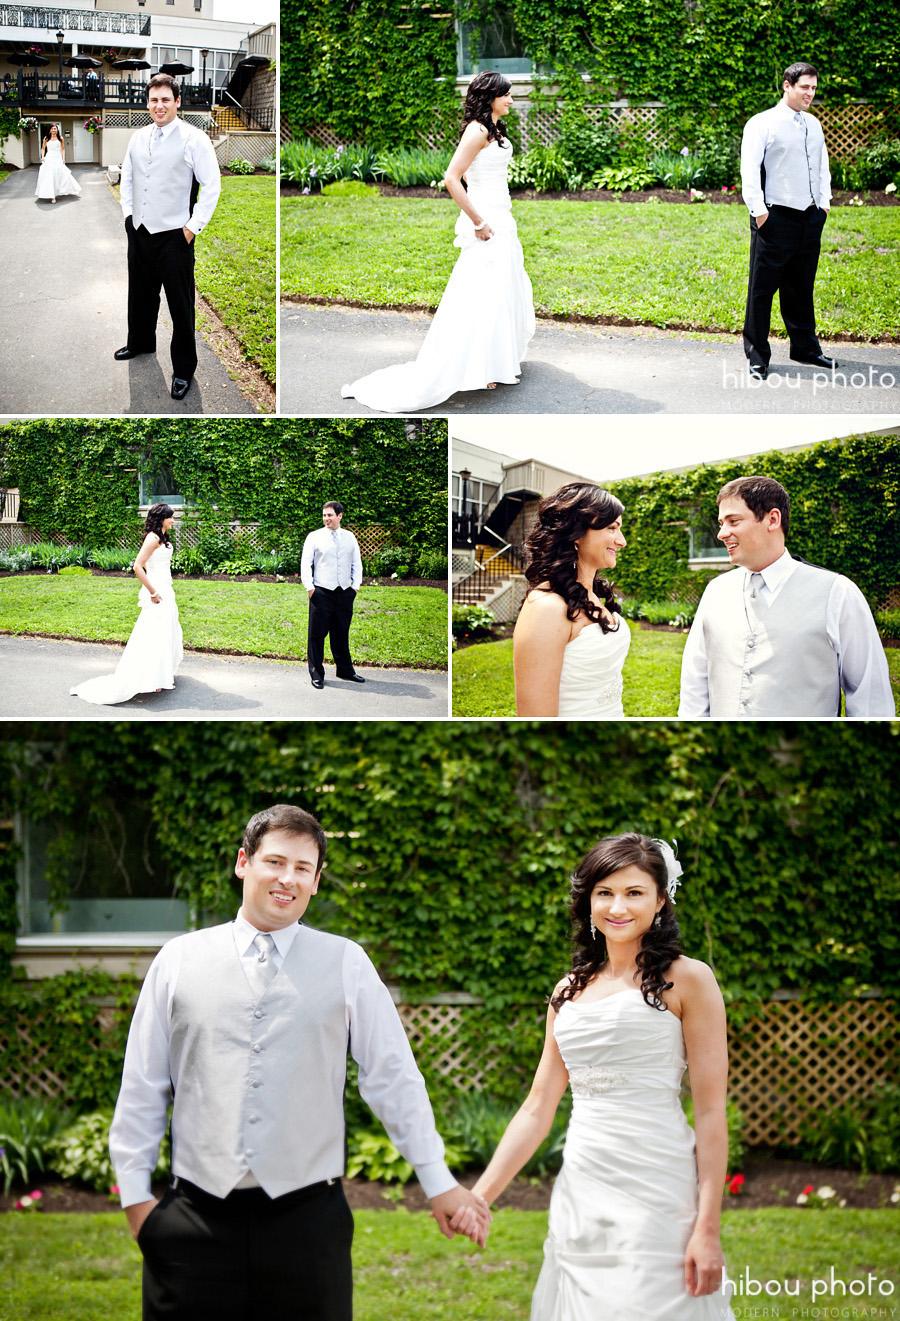 Fredericton wedding photography by hibou photo